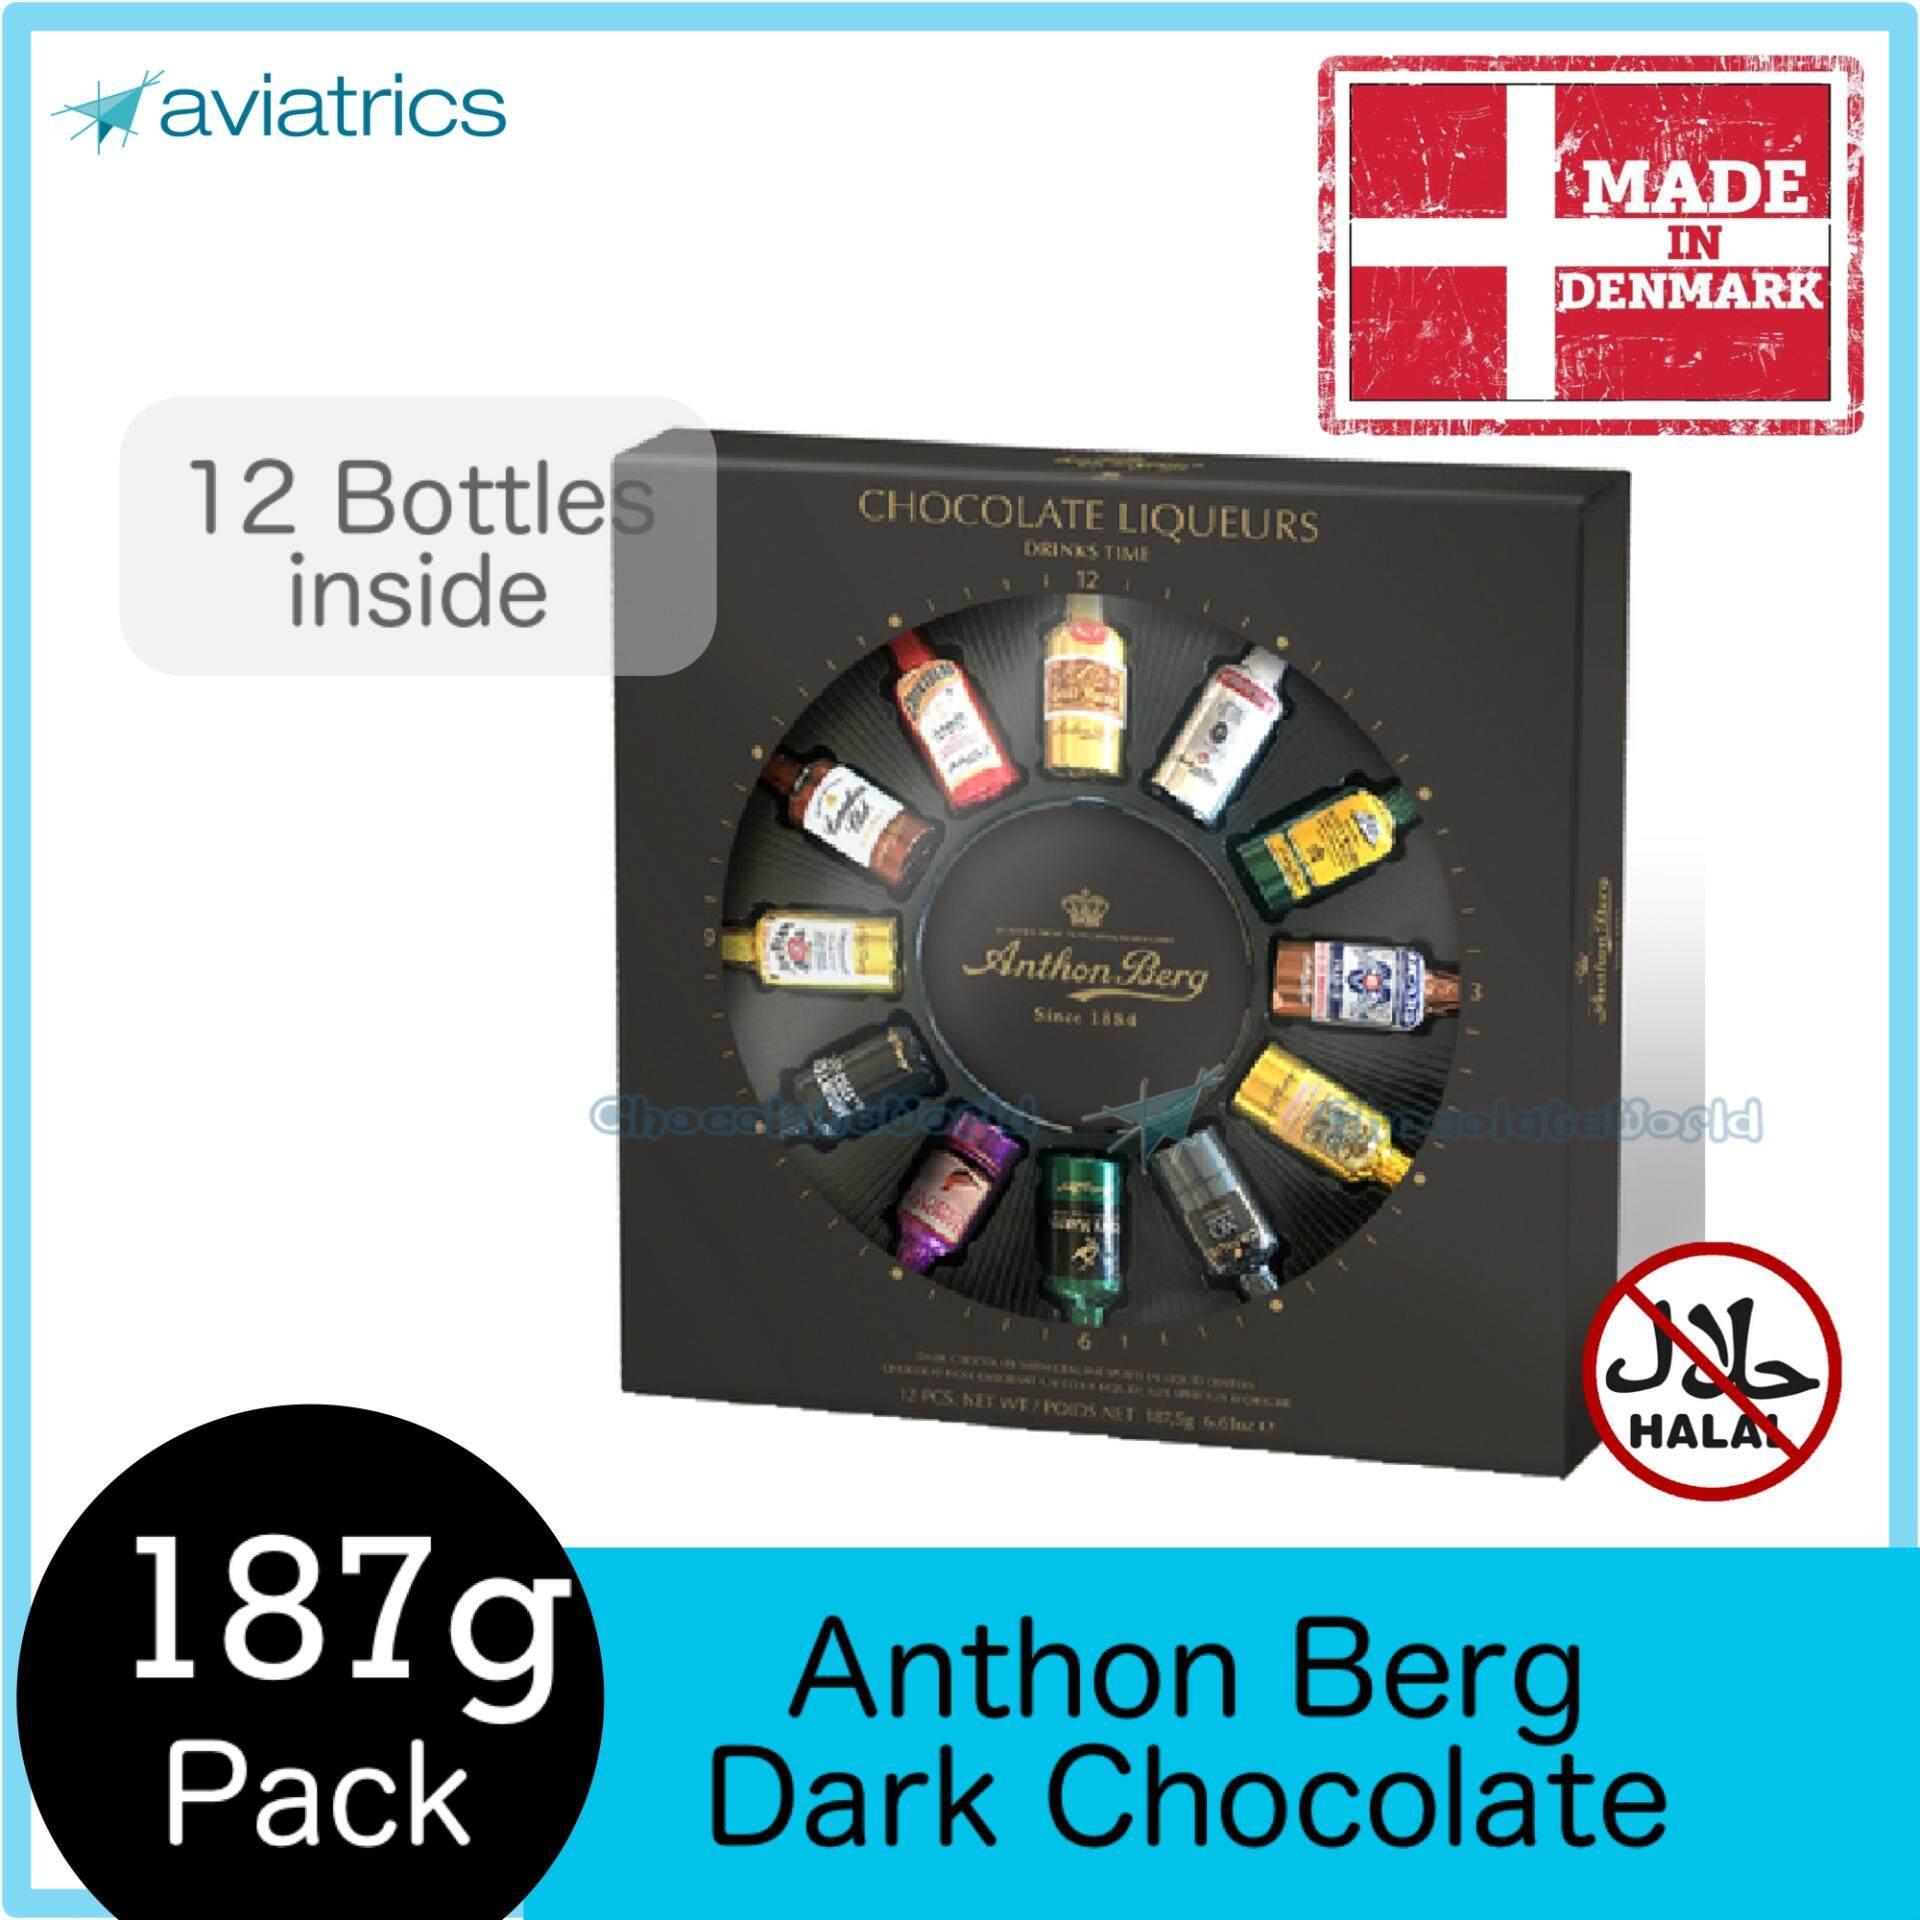 Anthon Berg Dark Chocolate Liqueur DrinkTime 12pc 187g (Made in Denmark)